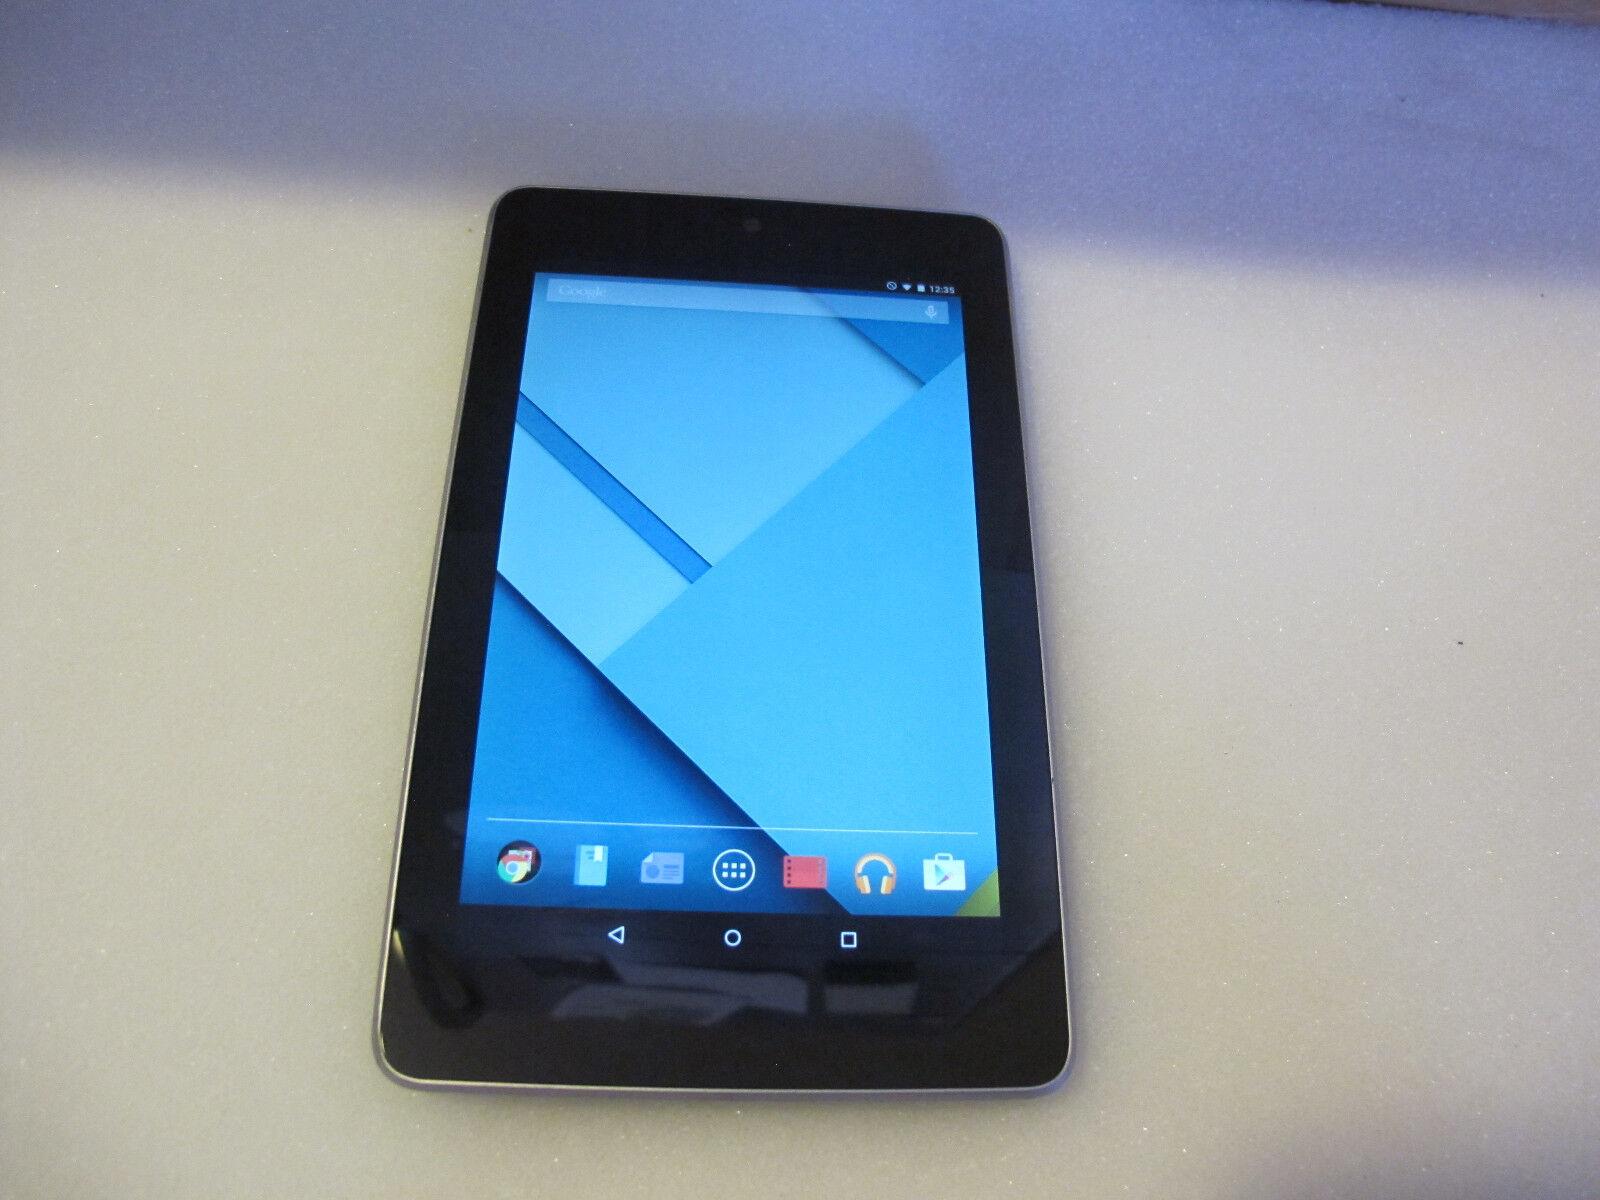 asus google nexus 7 me370t 32gb tablet android 5 1 ebay. Black Bedroom Furniture Sets. Home Design Ideas